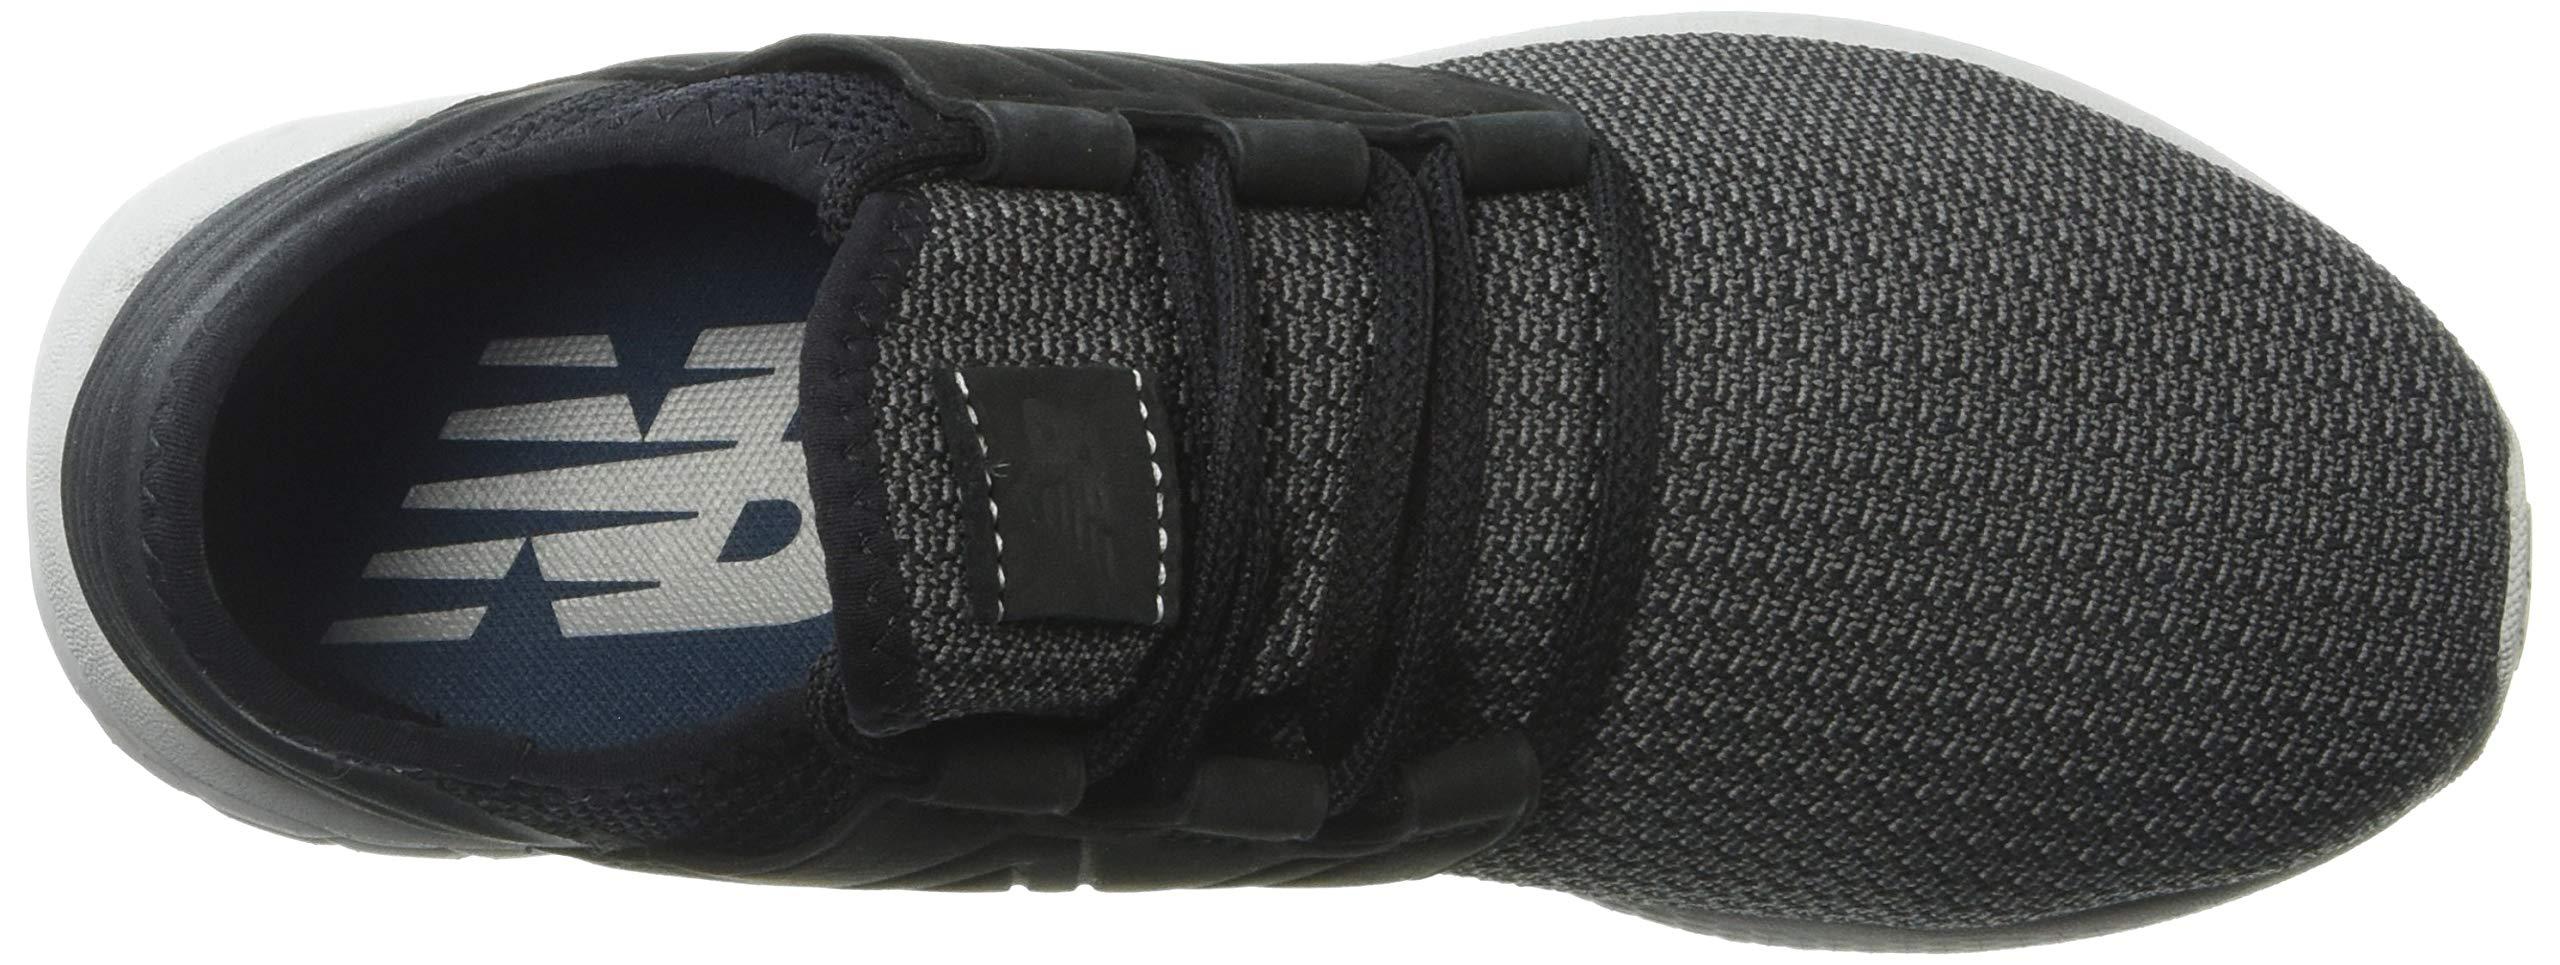 New Balance Men's Cruz V2 Fresh Foam Running Shoe, black/castlerock/nubuck, 7 D US by New Balance (Image #8)